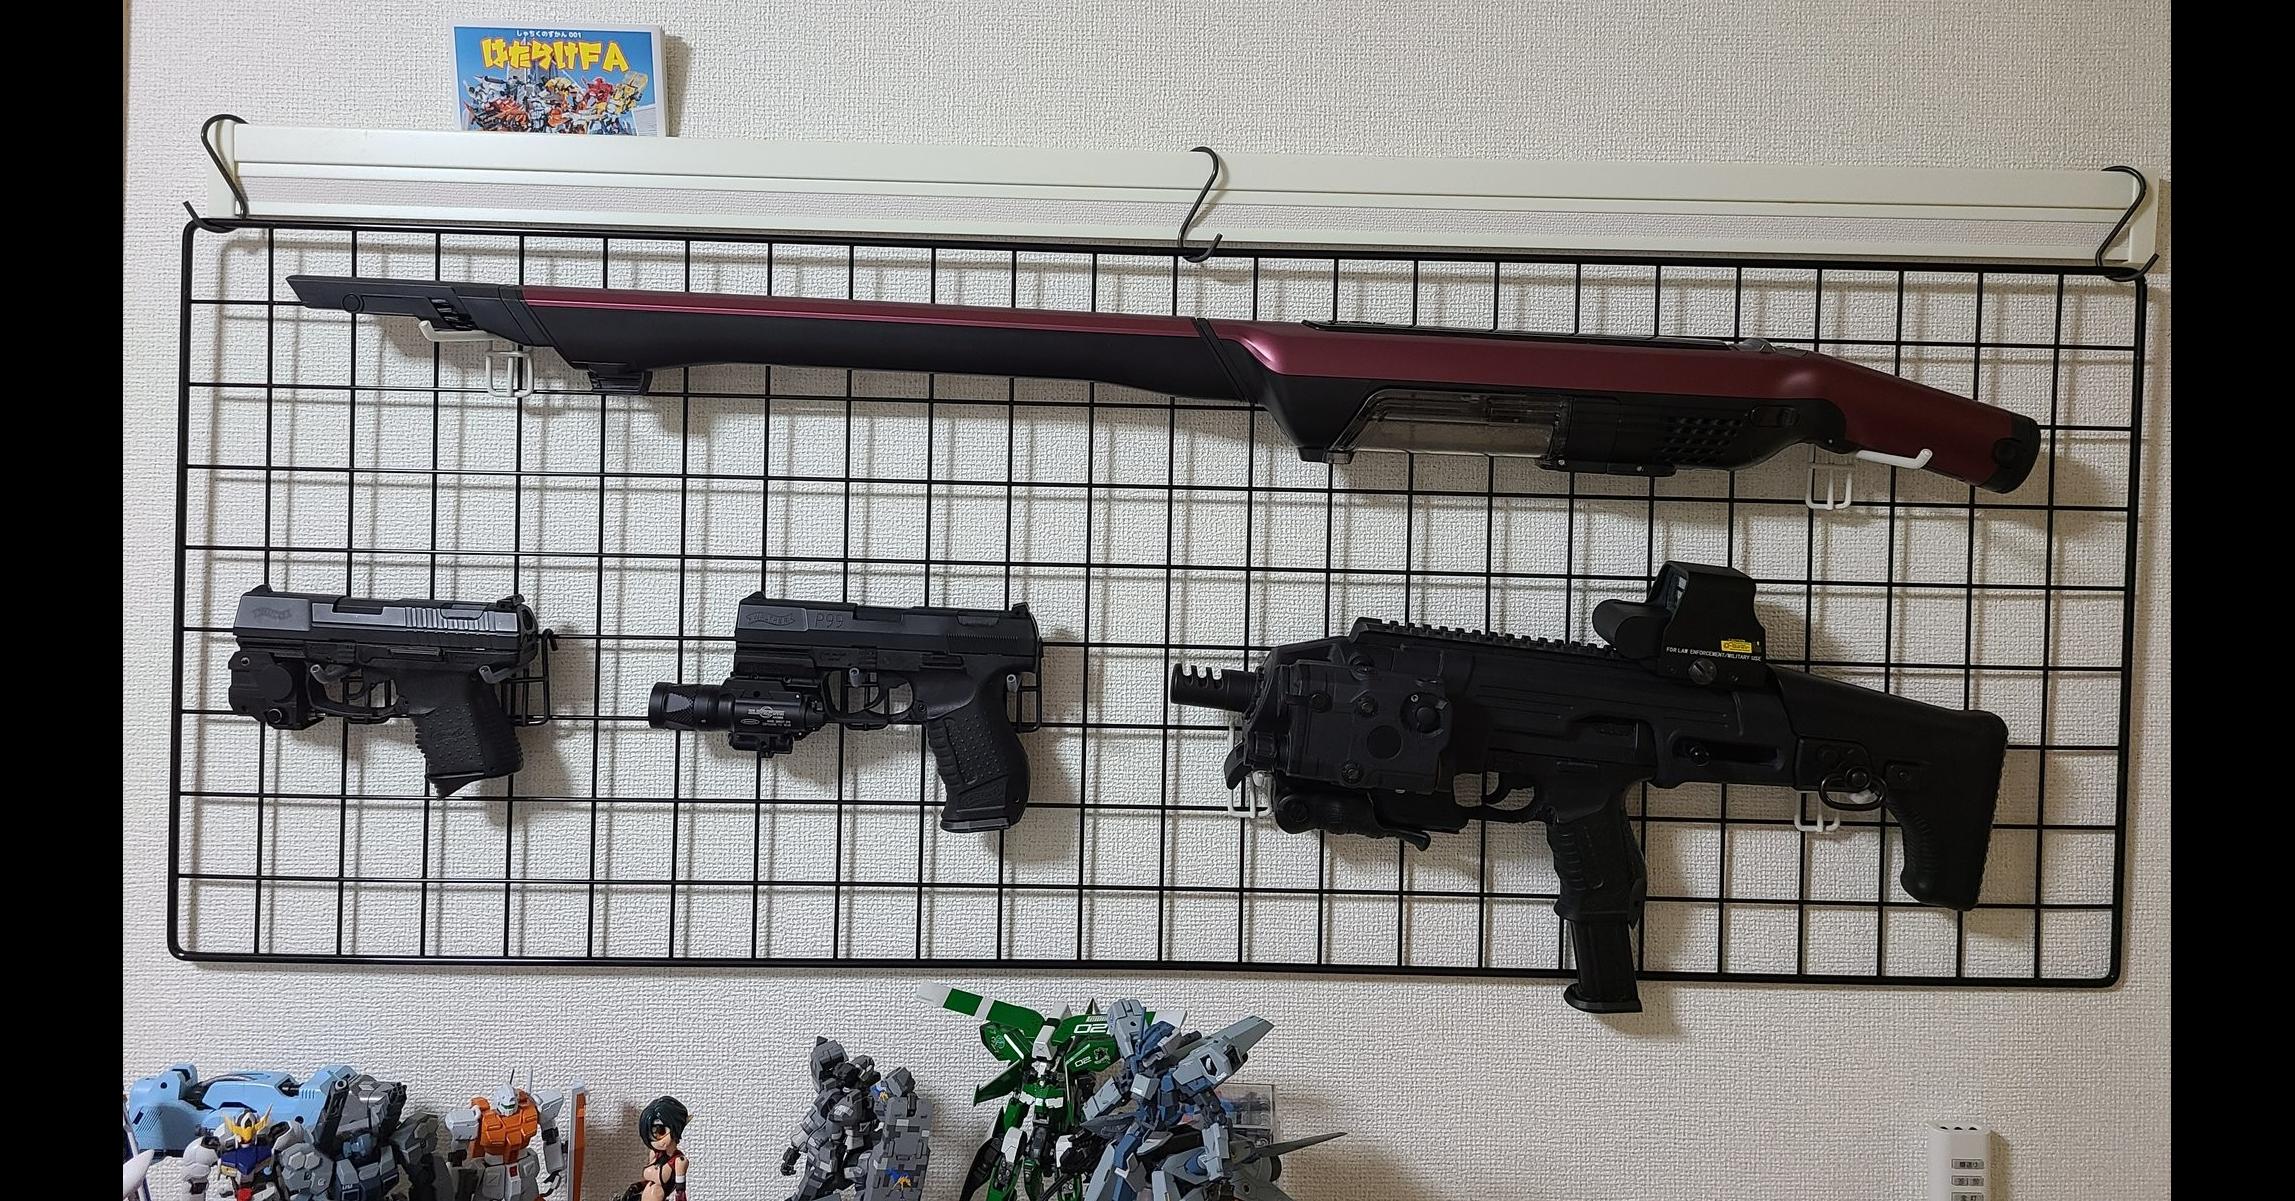 照片中提到了性けFA、章、P99,包含了槍、槍